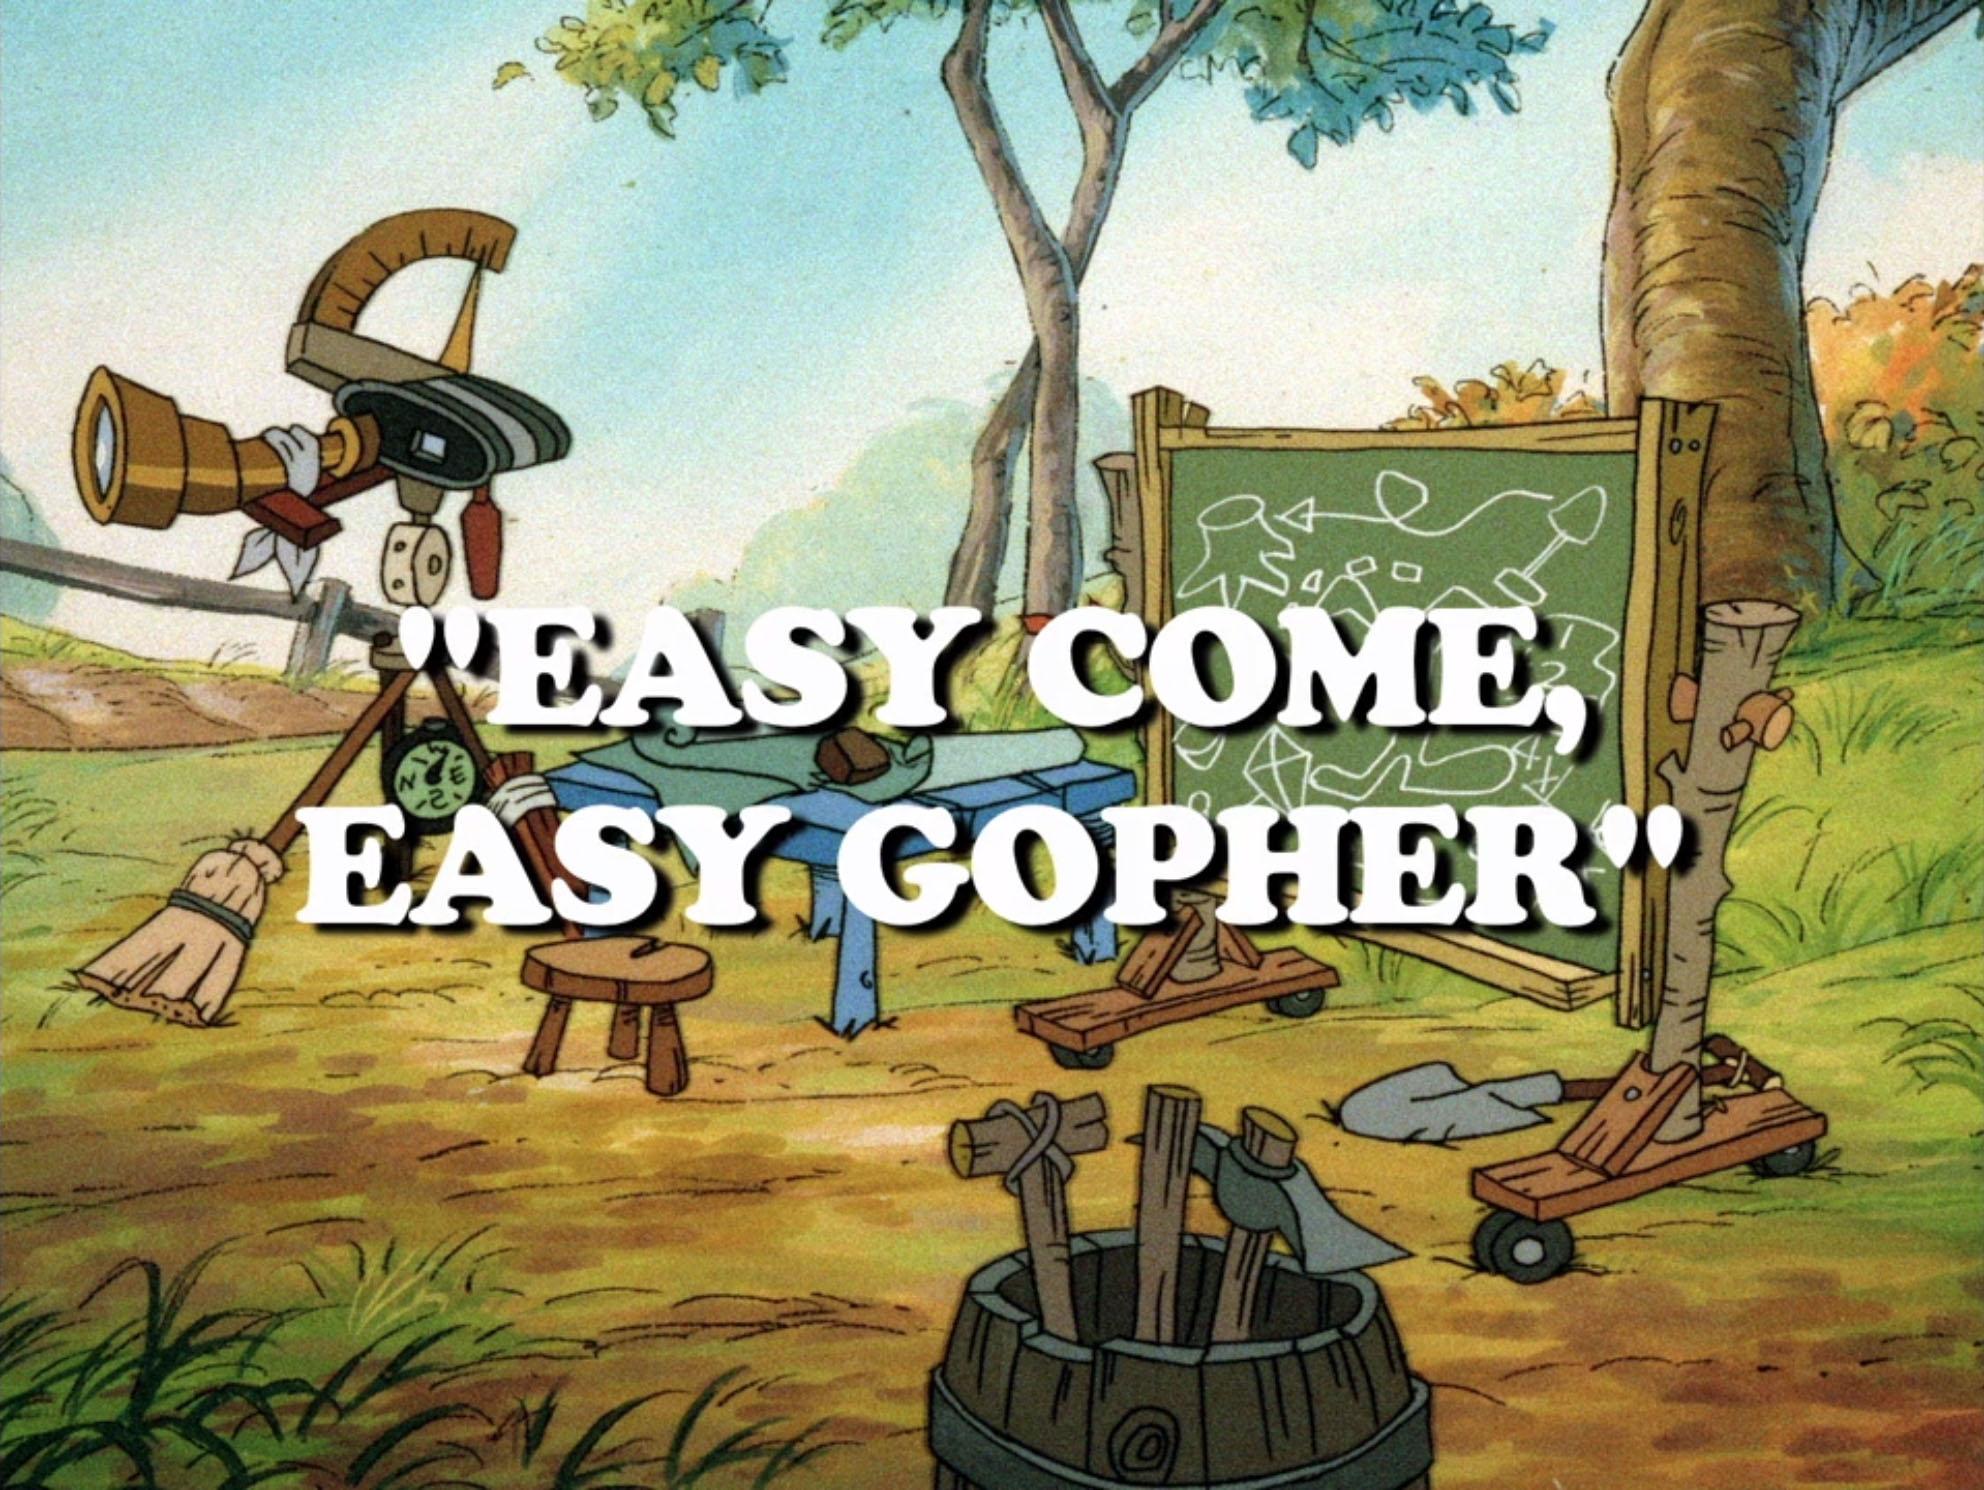 File:Easycomeeasygopher.jpg